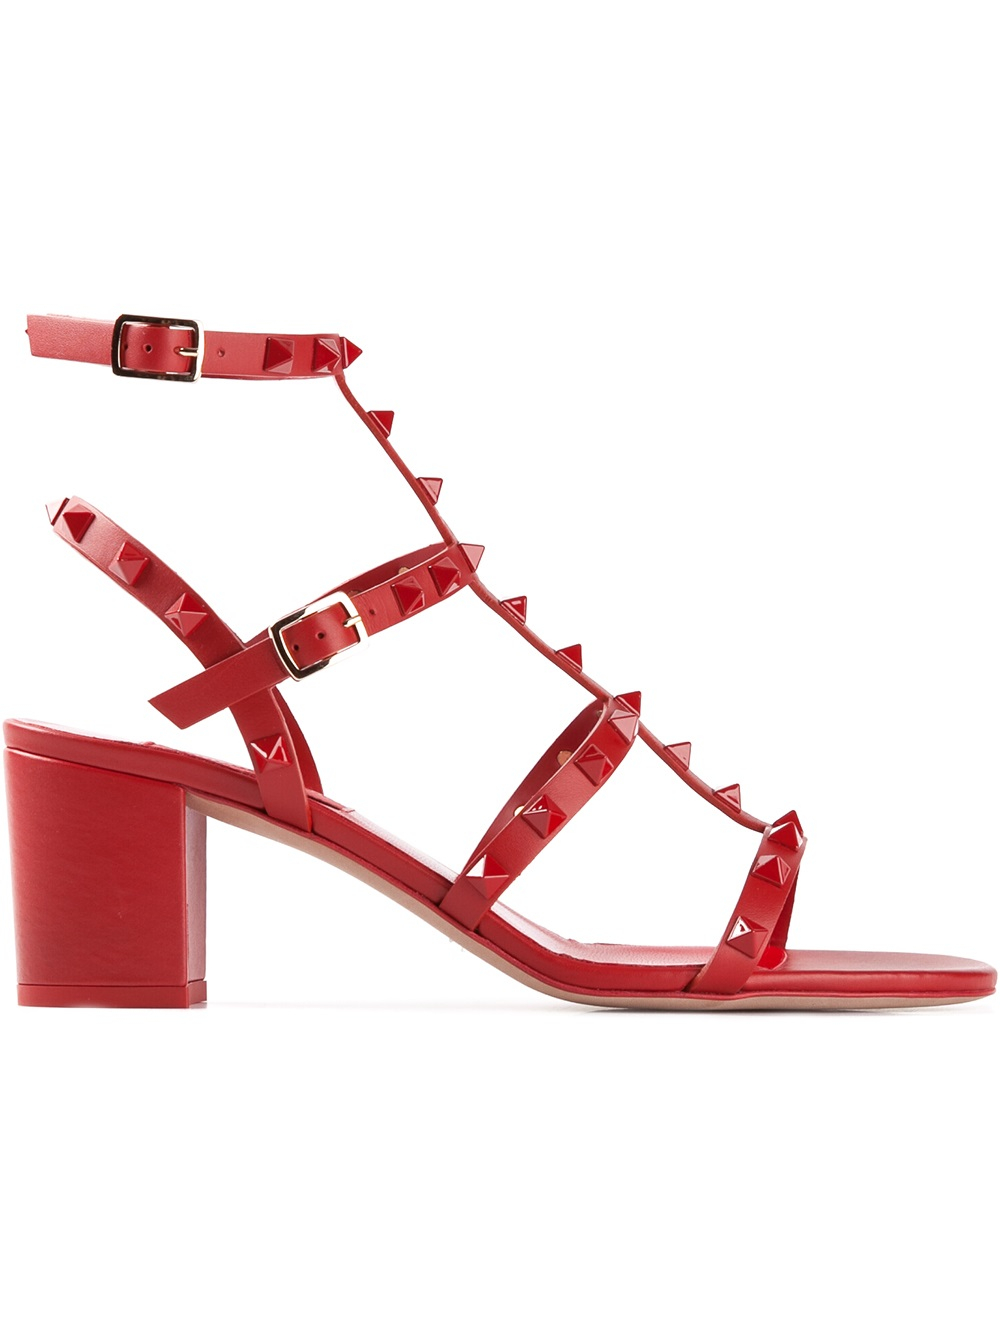 Valentino Rockstud Sandal in Red - Lyst